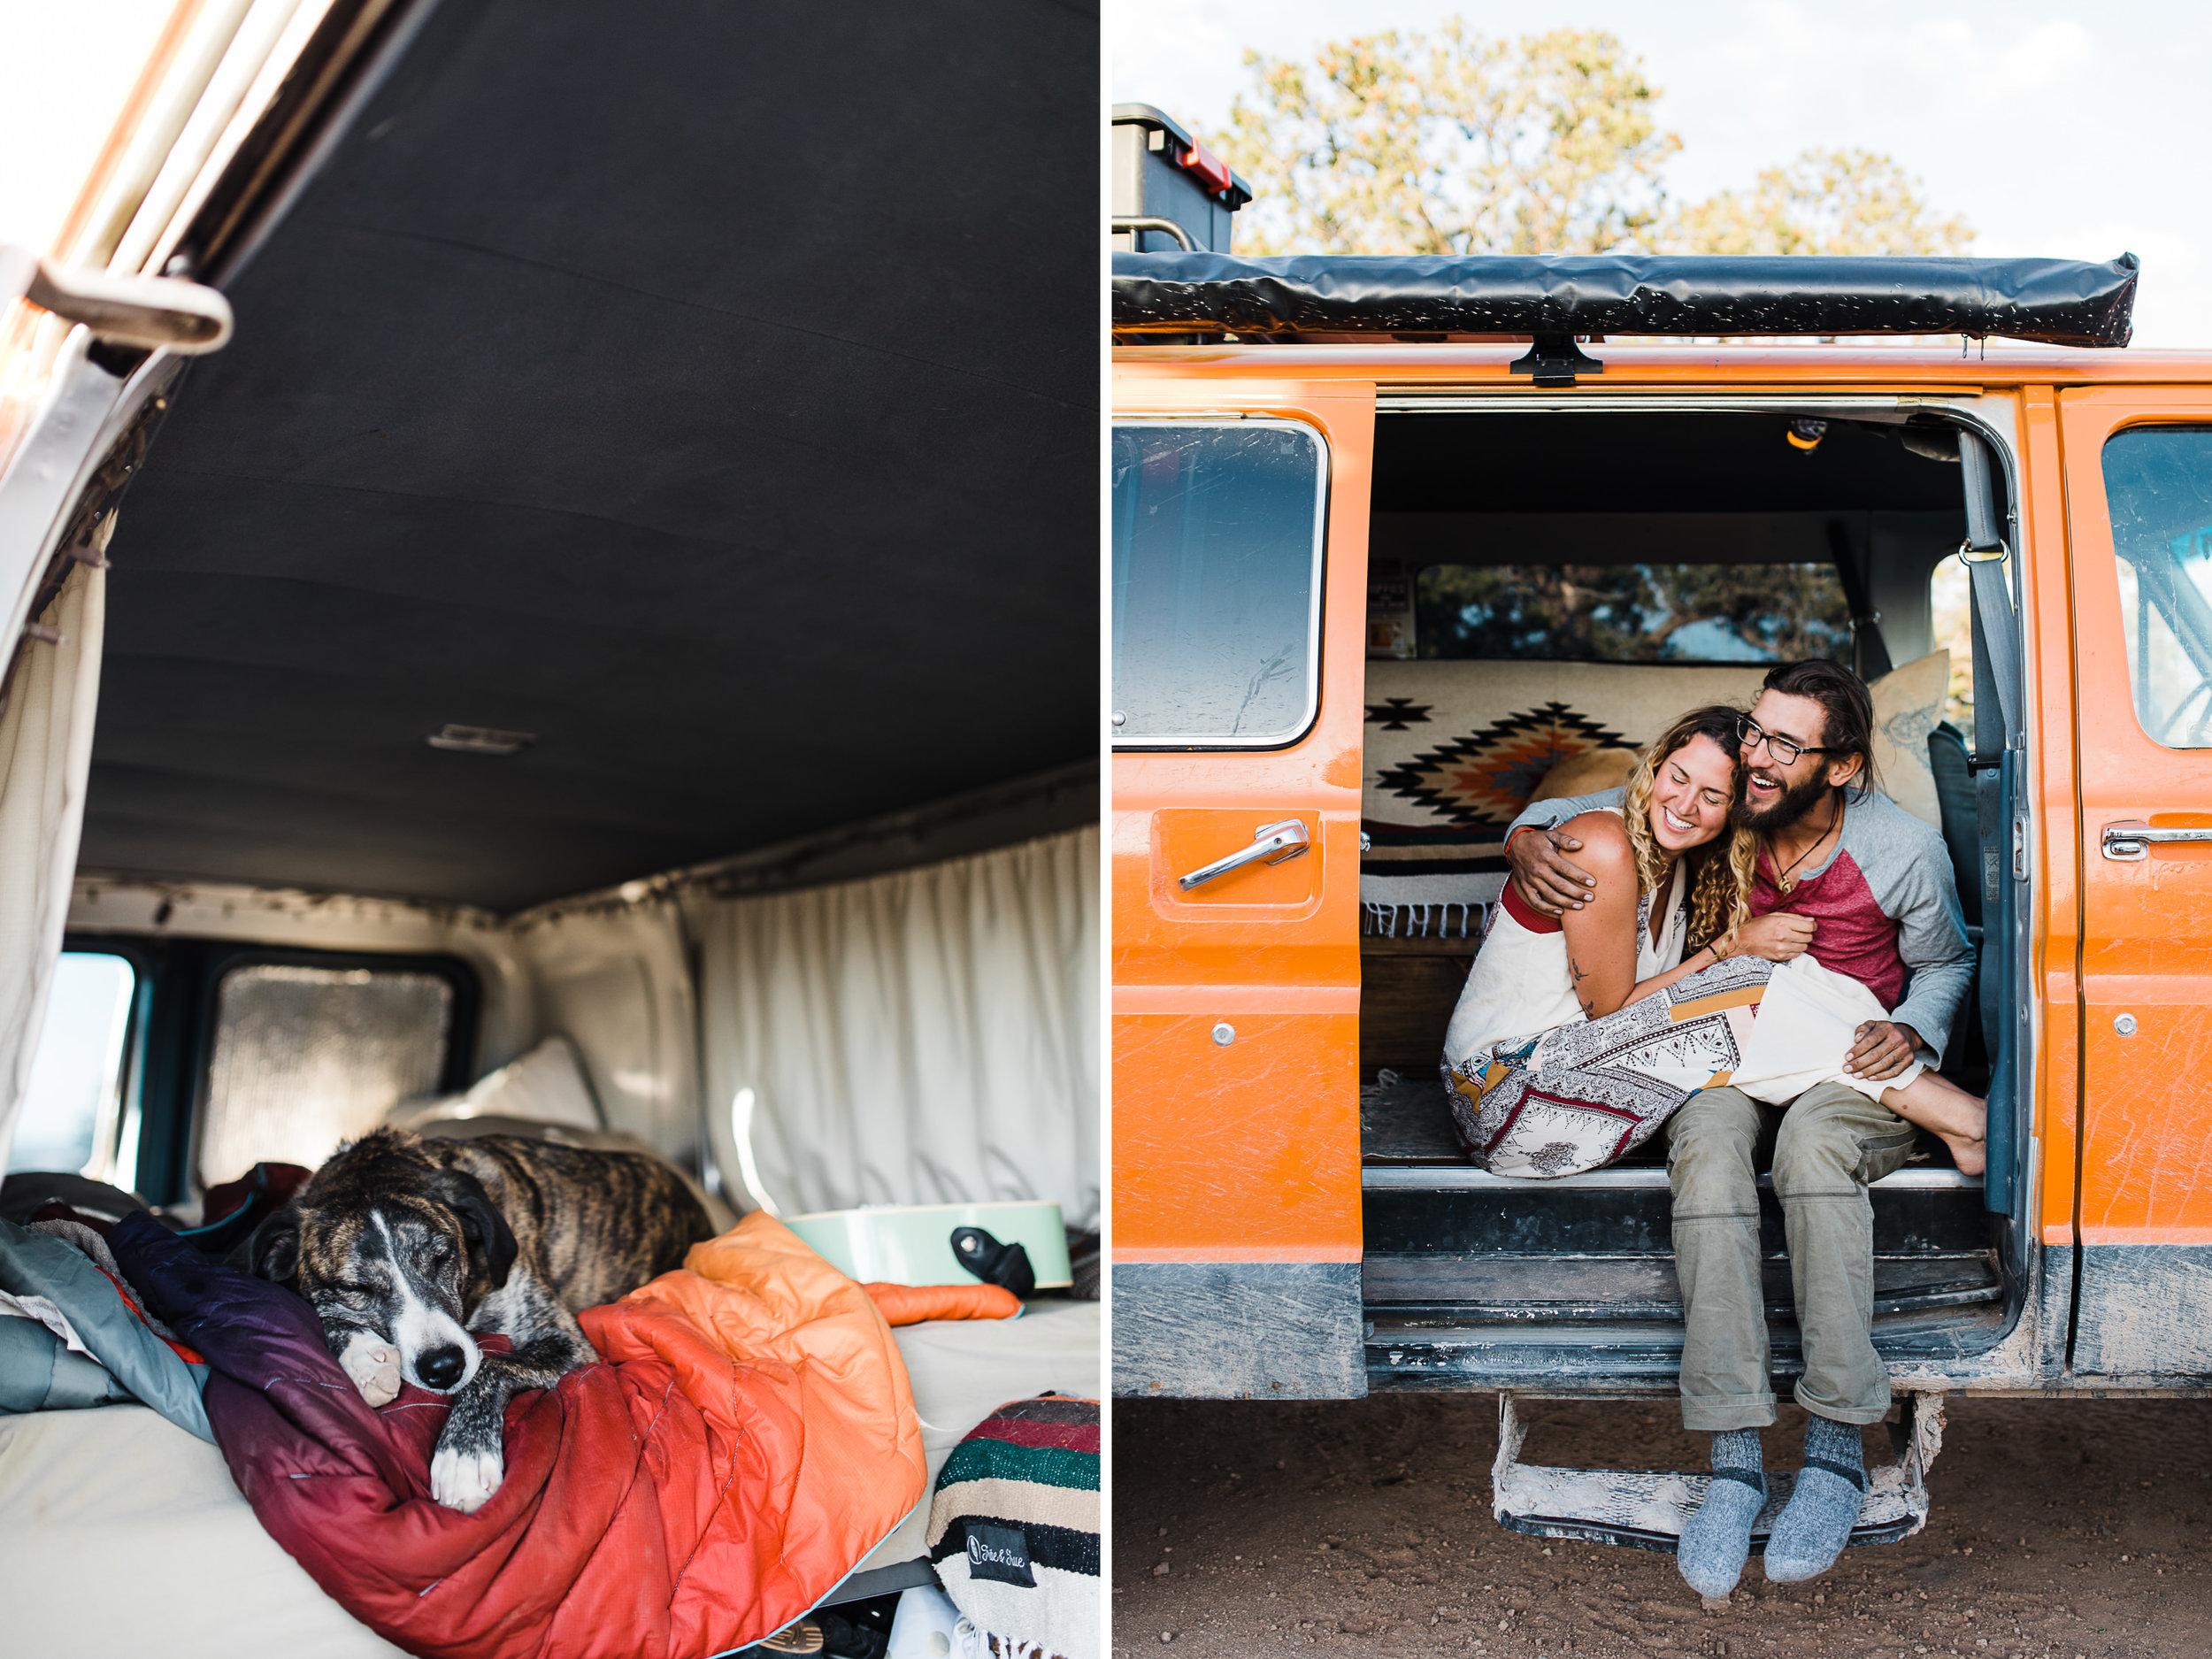 desert van life session | destination engagement photo inspiration | utah adventure elopement photographers | the hearnes adventure photography | www.thehearnes.com